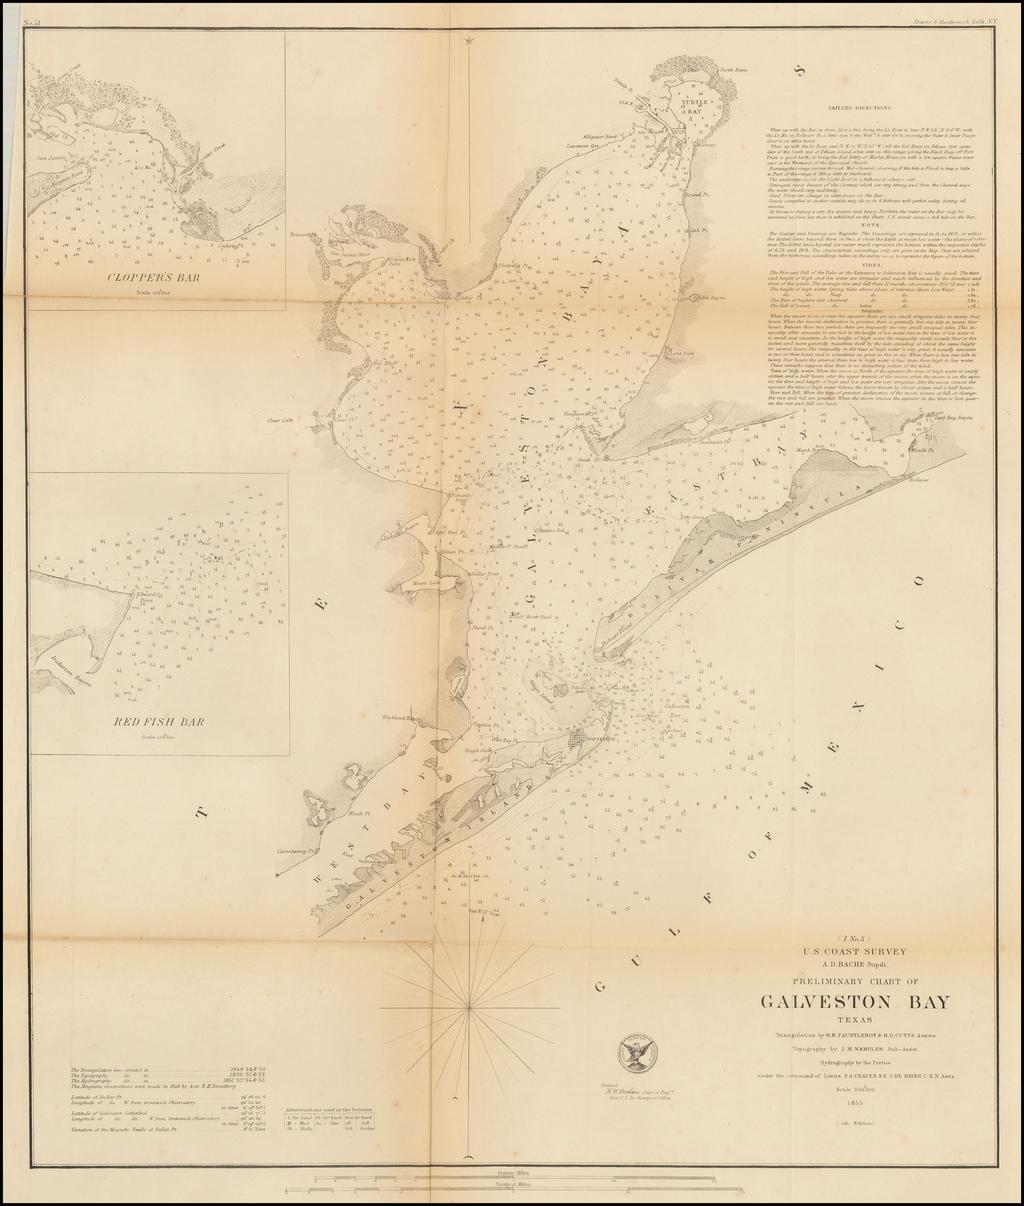 Preliminary Chart of Galveston Bay Texas . . . 1855 - Barry ... on velasco texas map, el paso texas map, la marque texas map, galveston island, san leon texas map, port arthur texas map, webster texas map, texas coastline map, new braunfels texas map, gonzales texas map, galveston bridge, nacogdoches texas map, gainesville texas map, san antonio texas map, harlingen texas map, galveston cruise terminal, beaumont texas map, kemah texas map, houston map, corpus christi map,